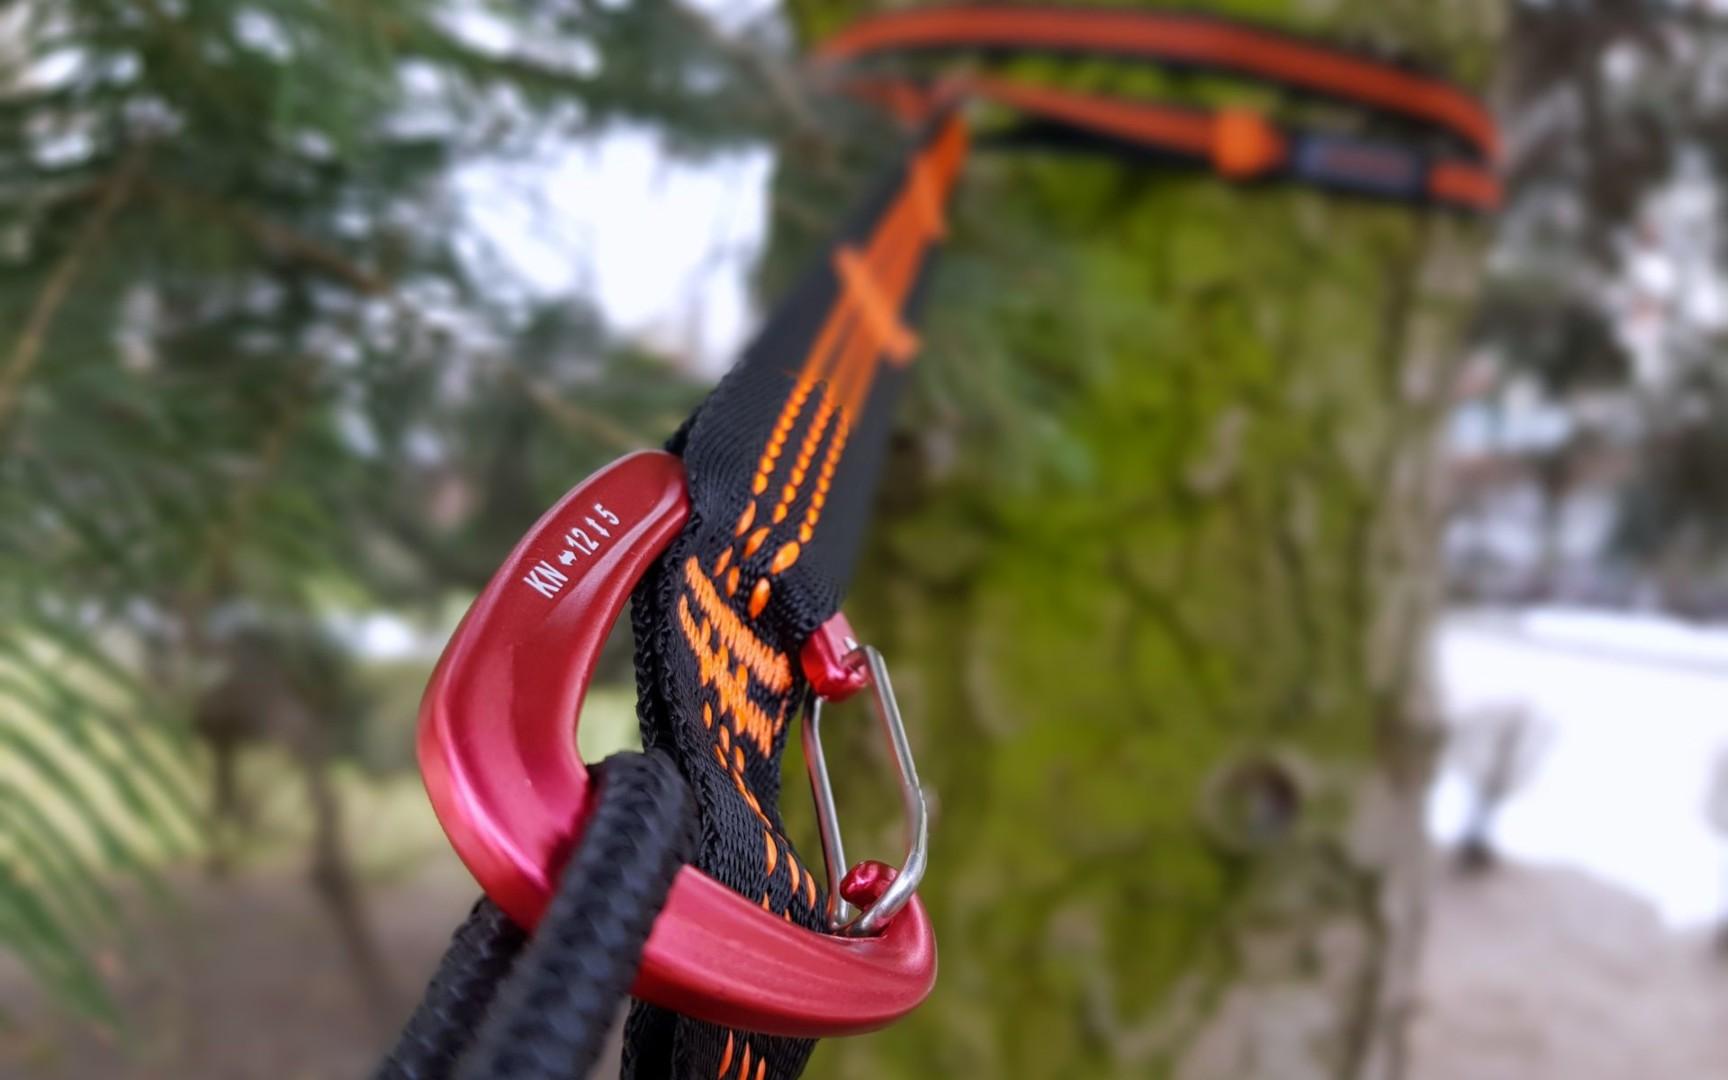 Bushmen hammock suspension system easy